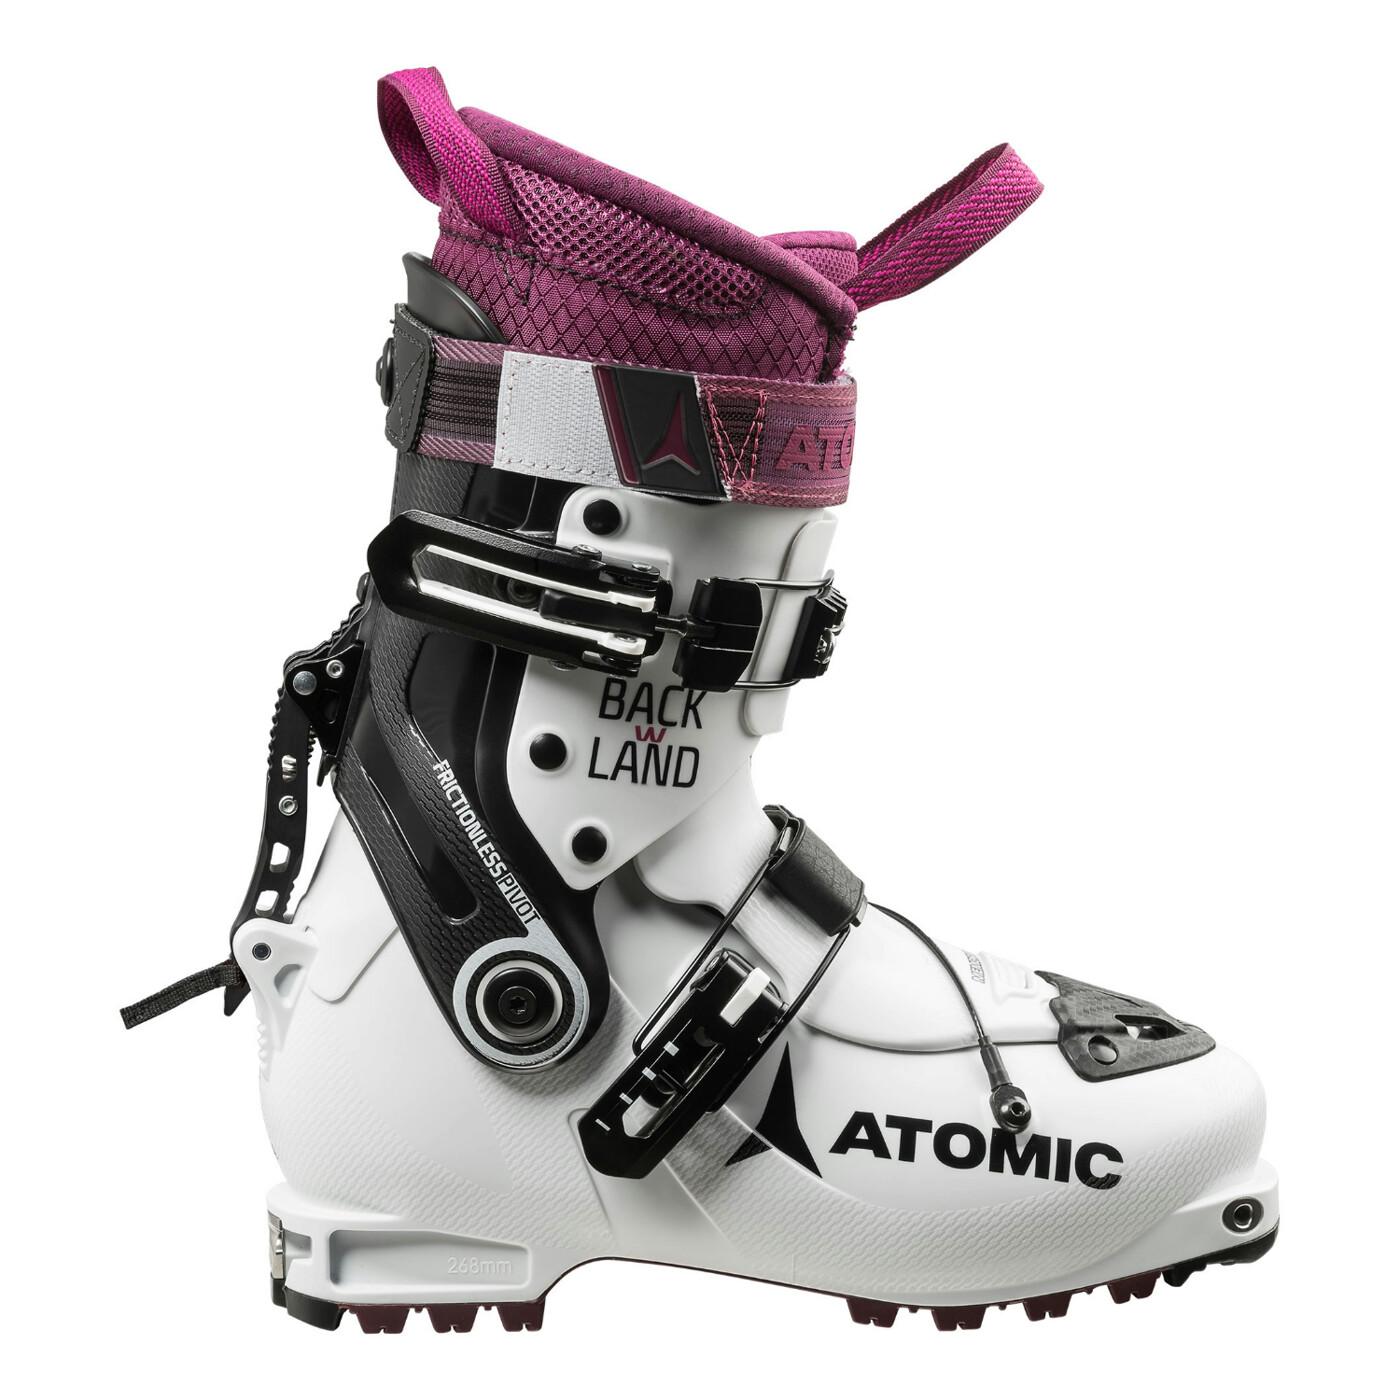 ATOMIC TOURENSCHUH BACKLAND W White/Purple/Black - Damen